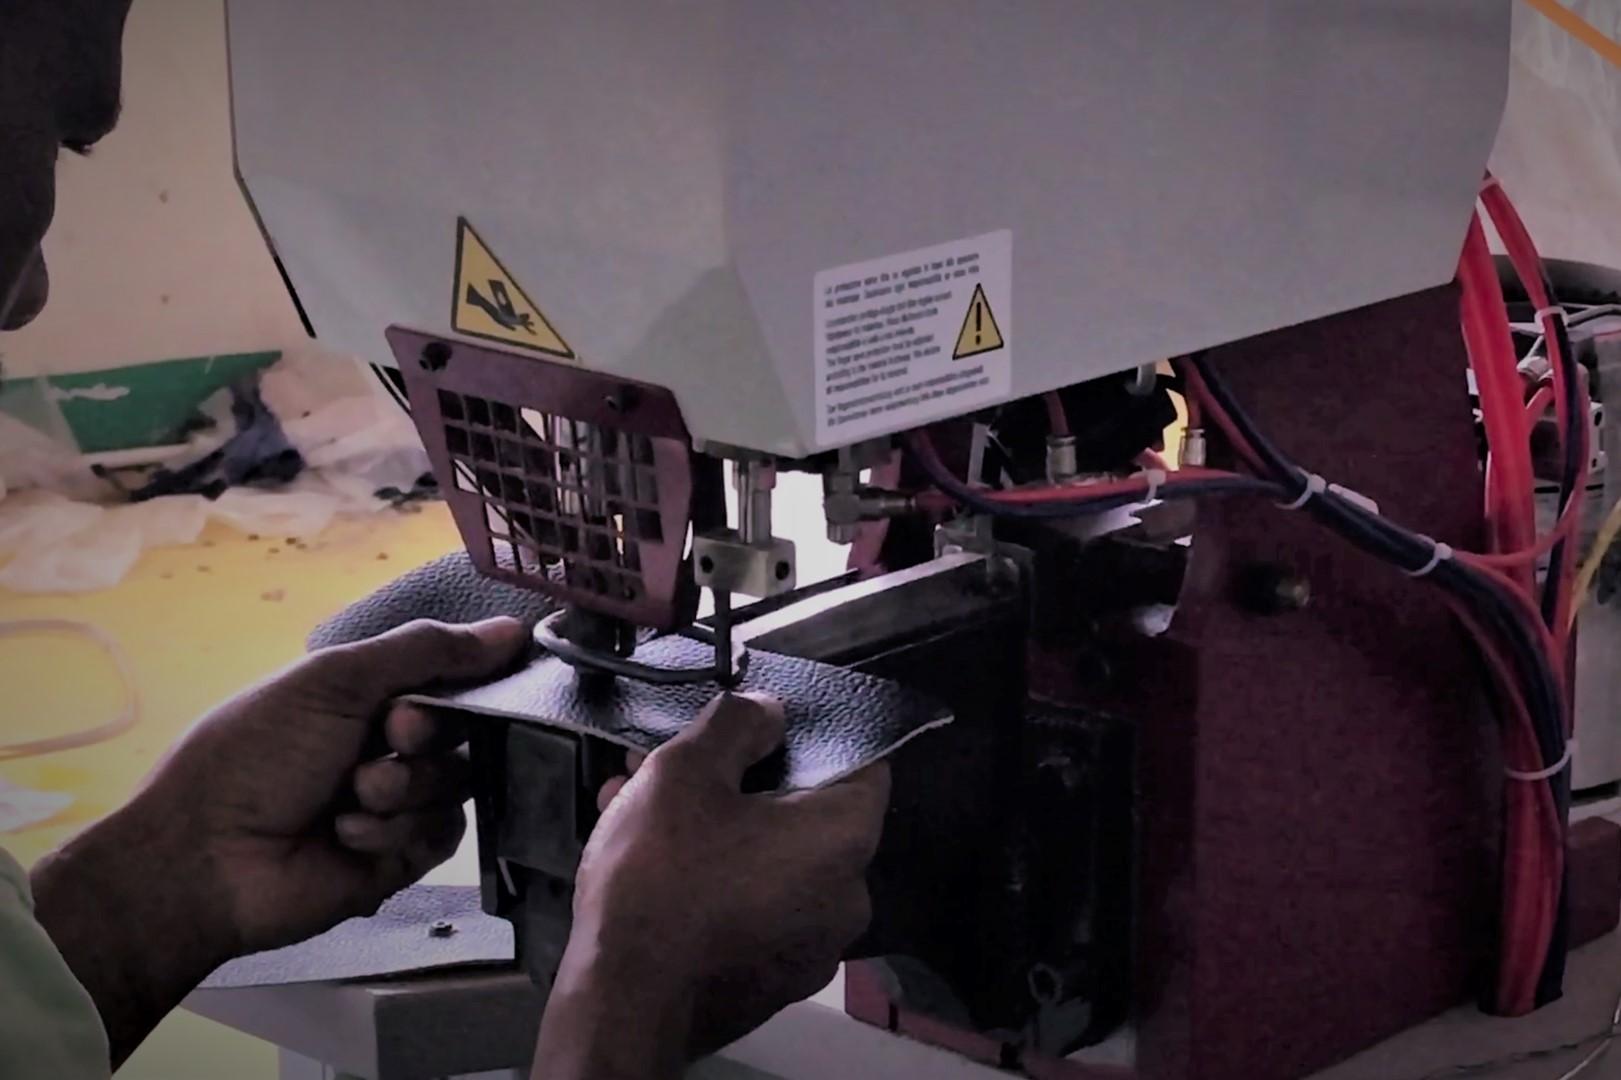 garment_0018_3.BUTTON EYELET RIVET ATTACHING MACHINES_garment project (4)